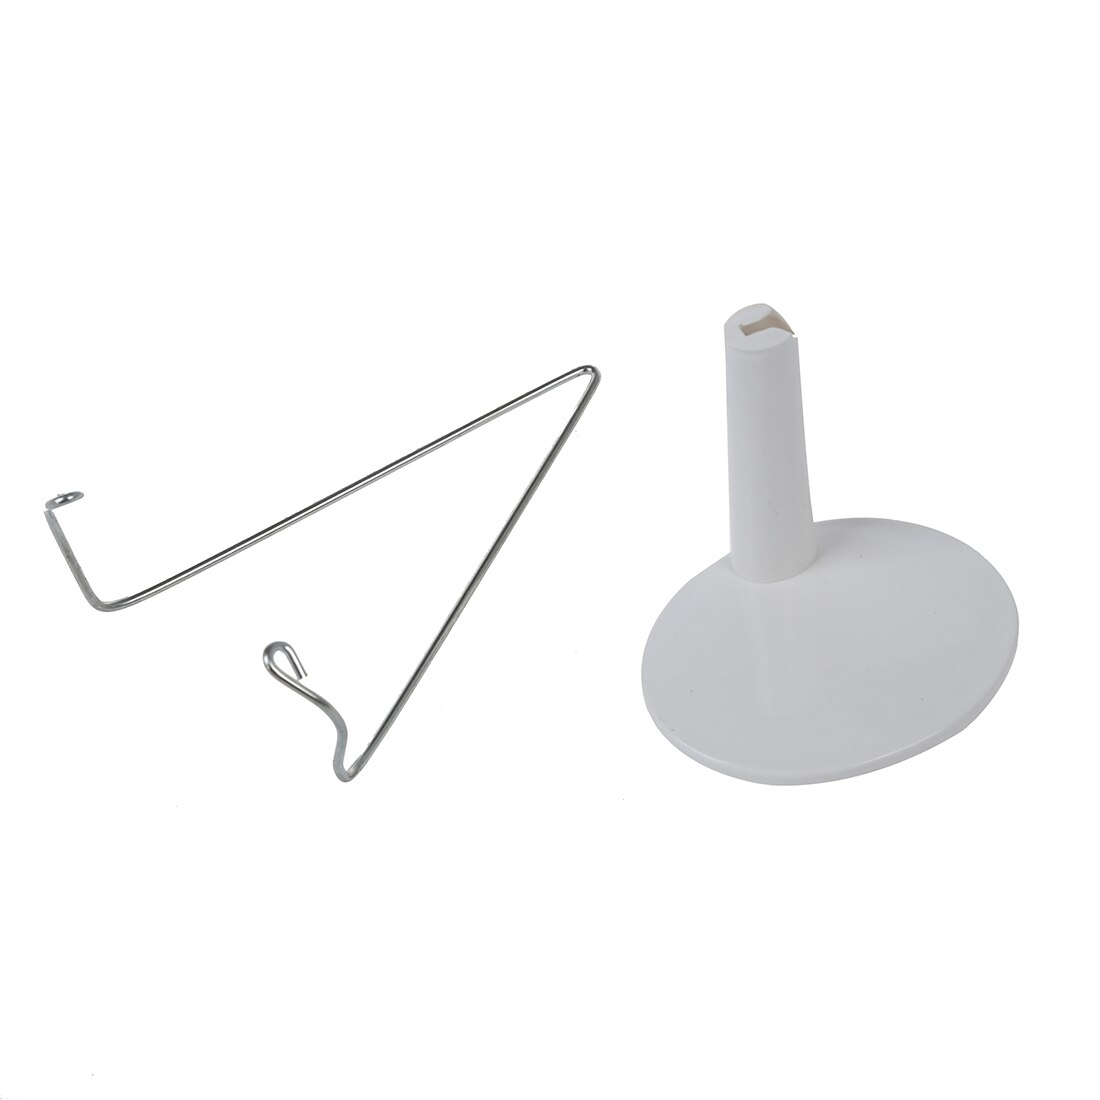 Abwe branco ajustável dollstand 3.3 - 4.3 polegadas